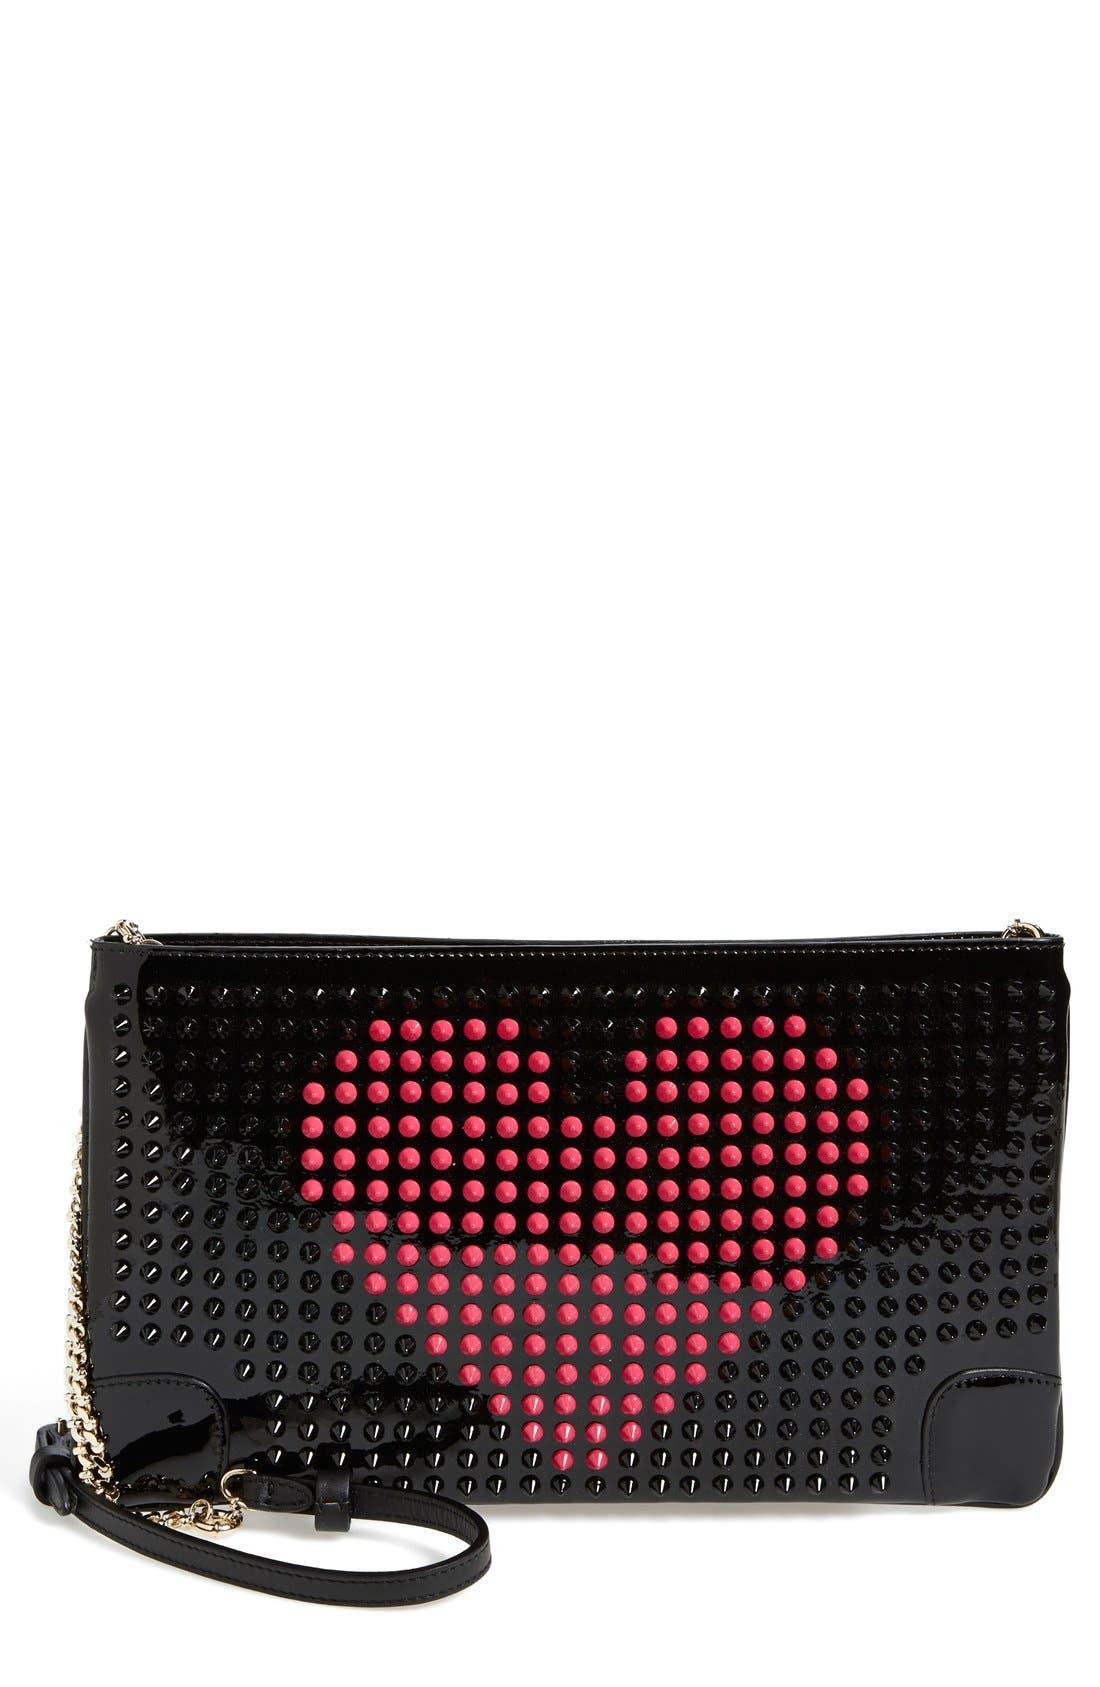 Main Image - Christian Louboutin 'Loubiposh Valentine' Studded Calfskin Clutch